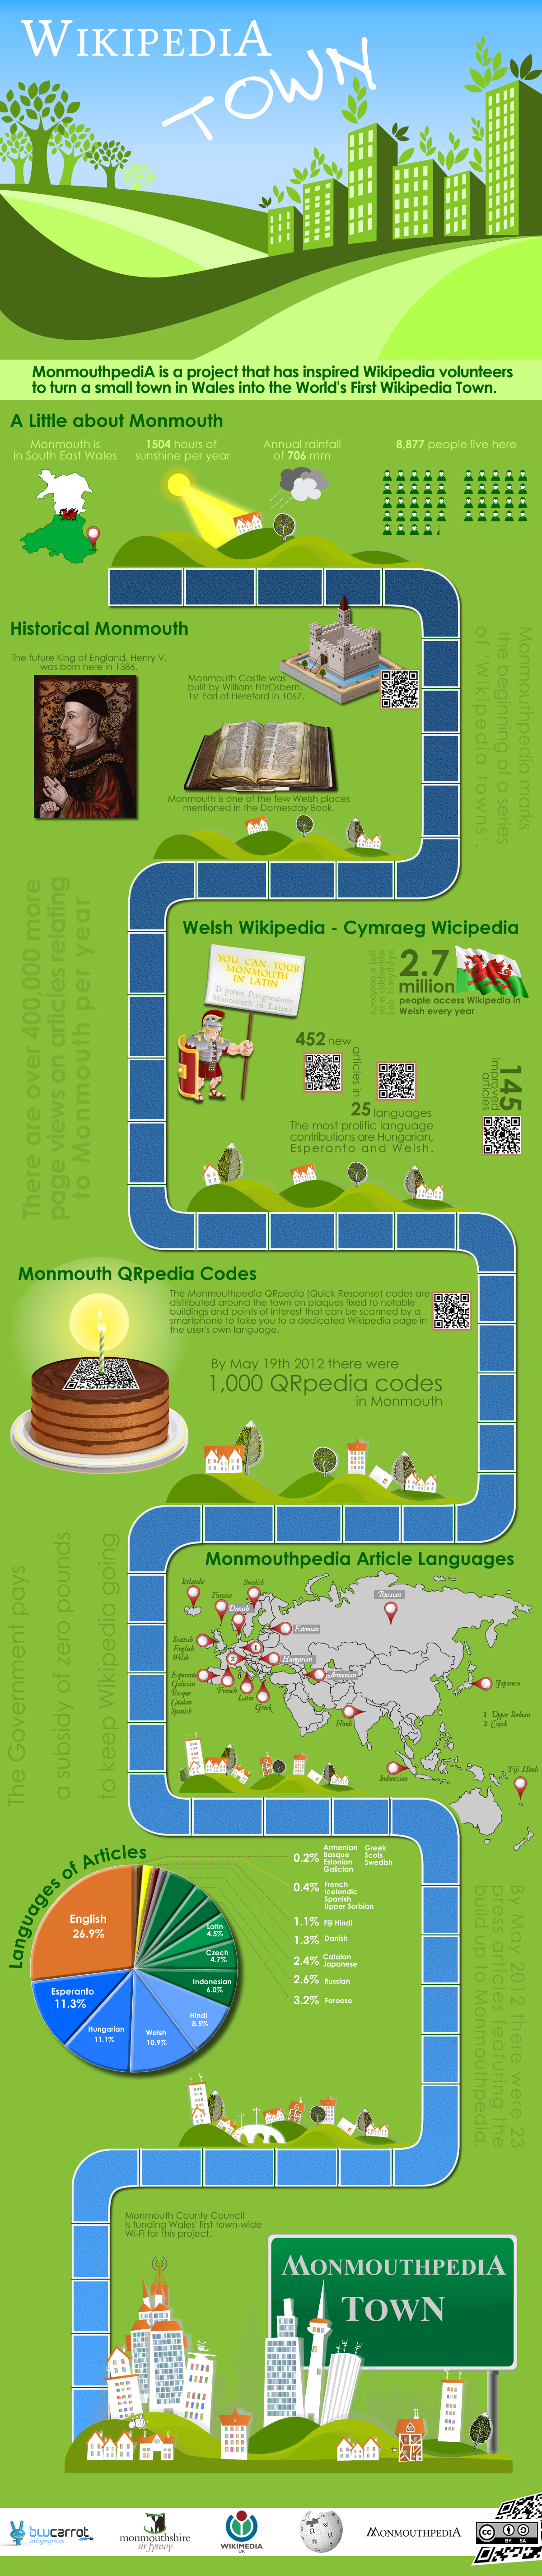 MonmouthpediA infographic.jpg